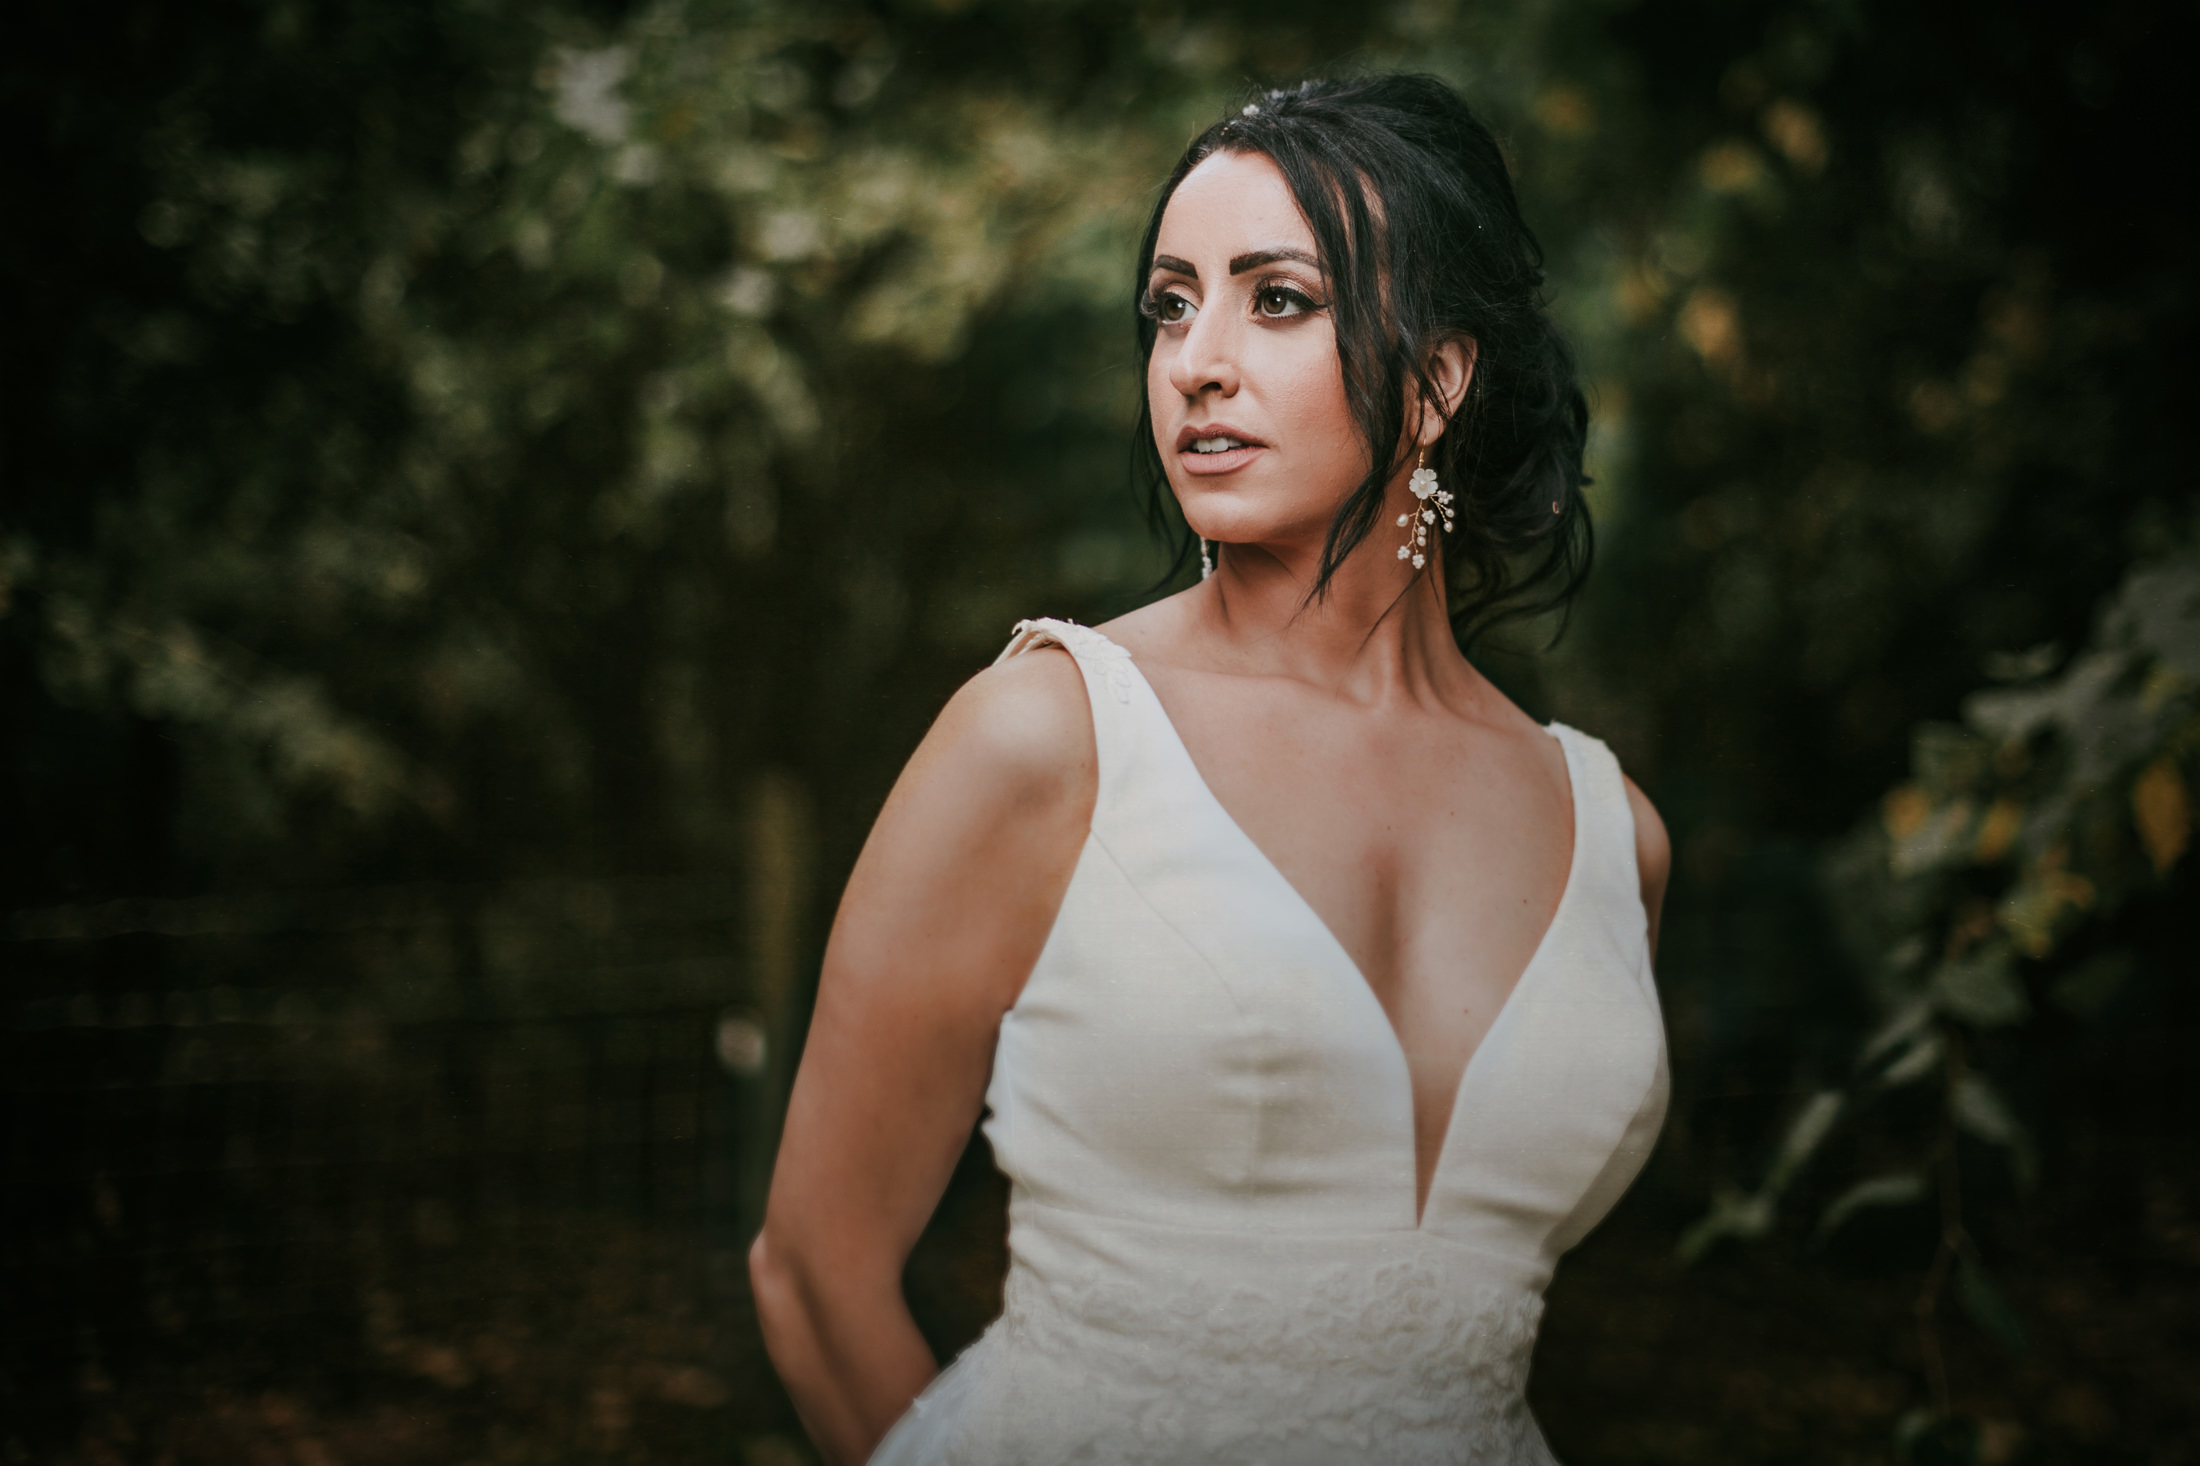 Woodland Wedding - nottingham outdoor wedding venue - east midlands wedding planner - luxurious outdoor wedding